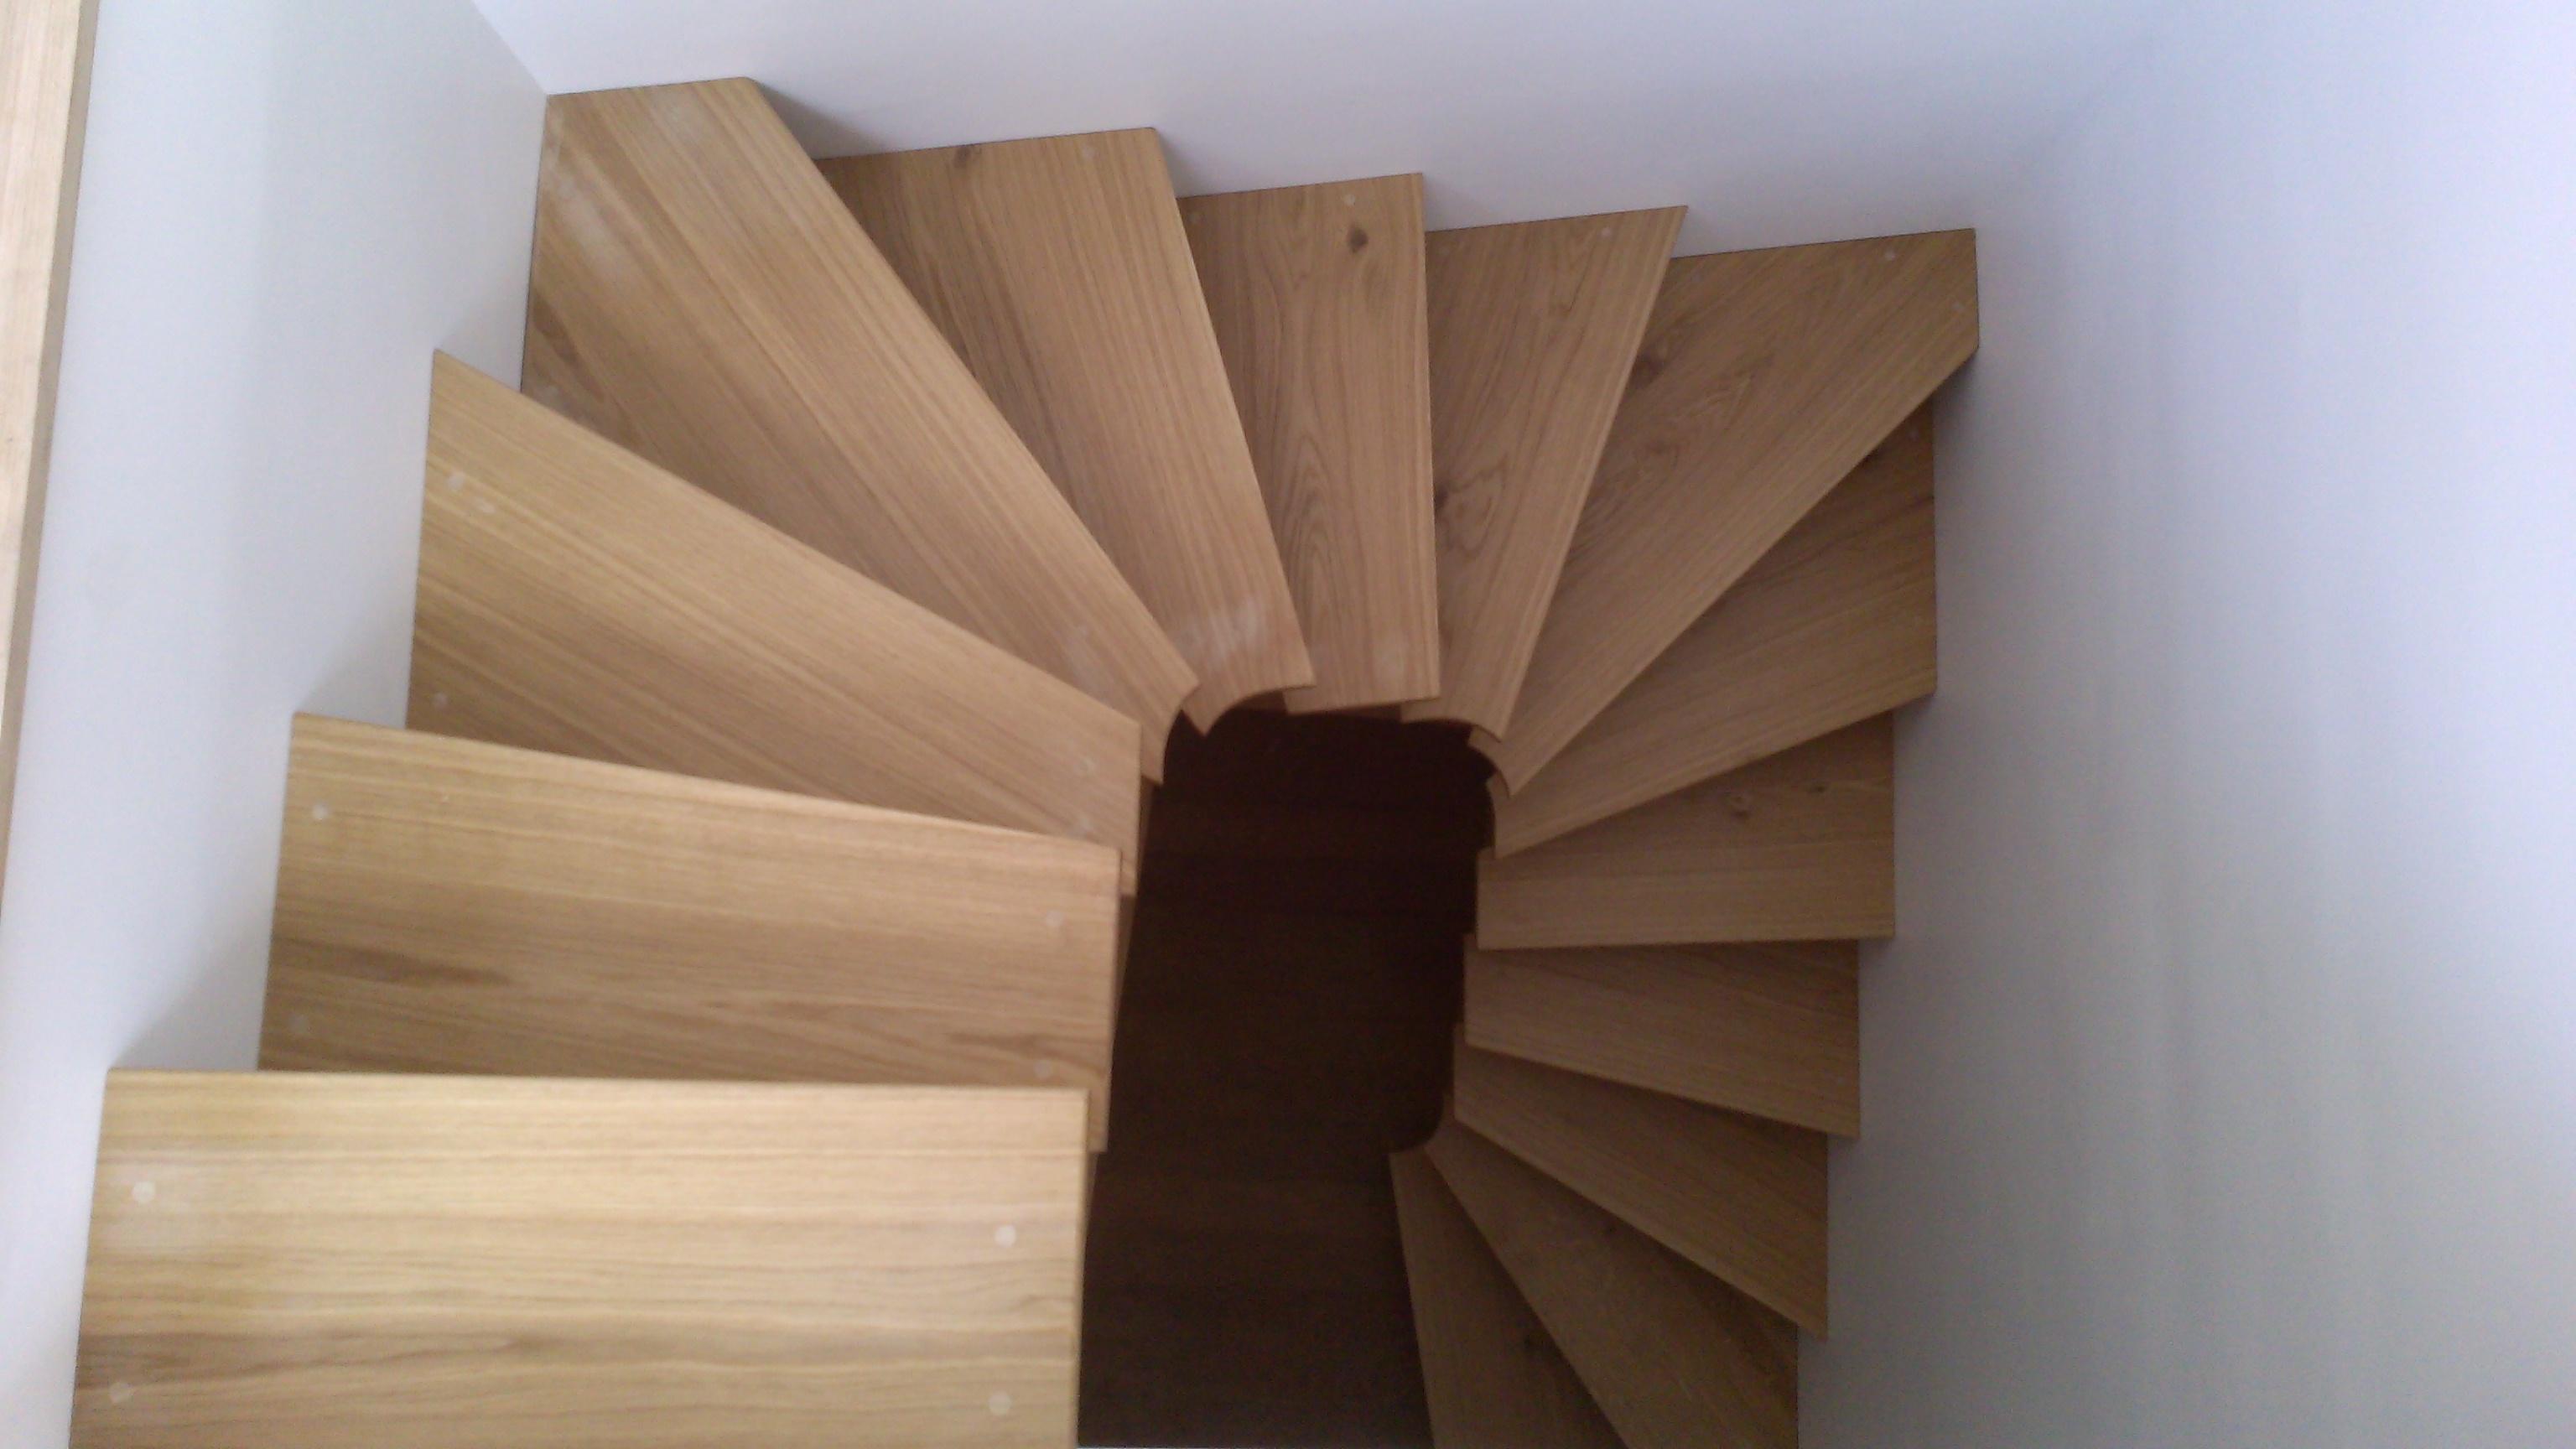 escalier 3 4 tournant juillet 2014 menuiserie eb nisterie. Black Bedroom Furniture Sets. Home Design Ideas